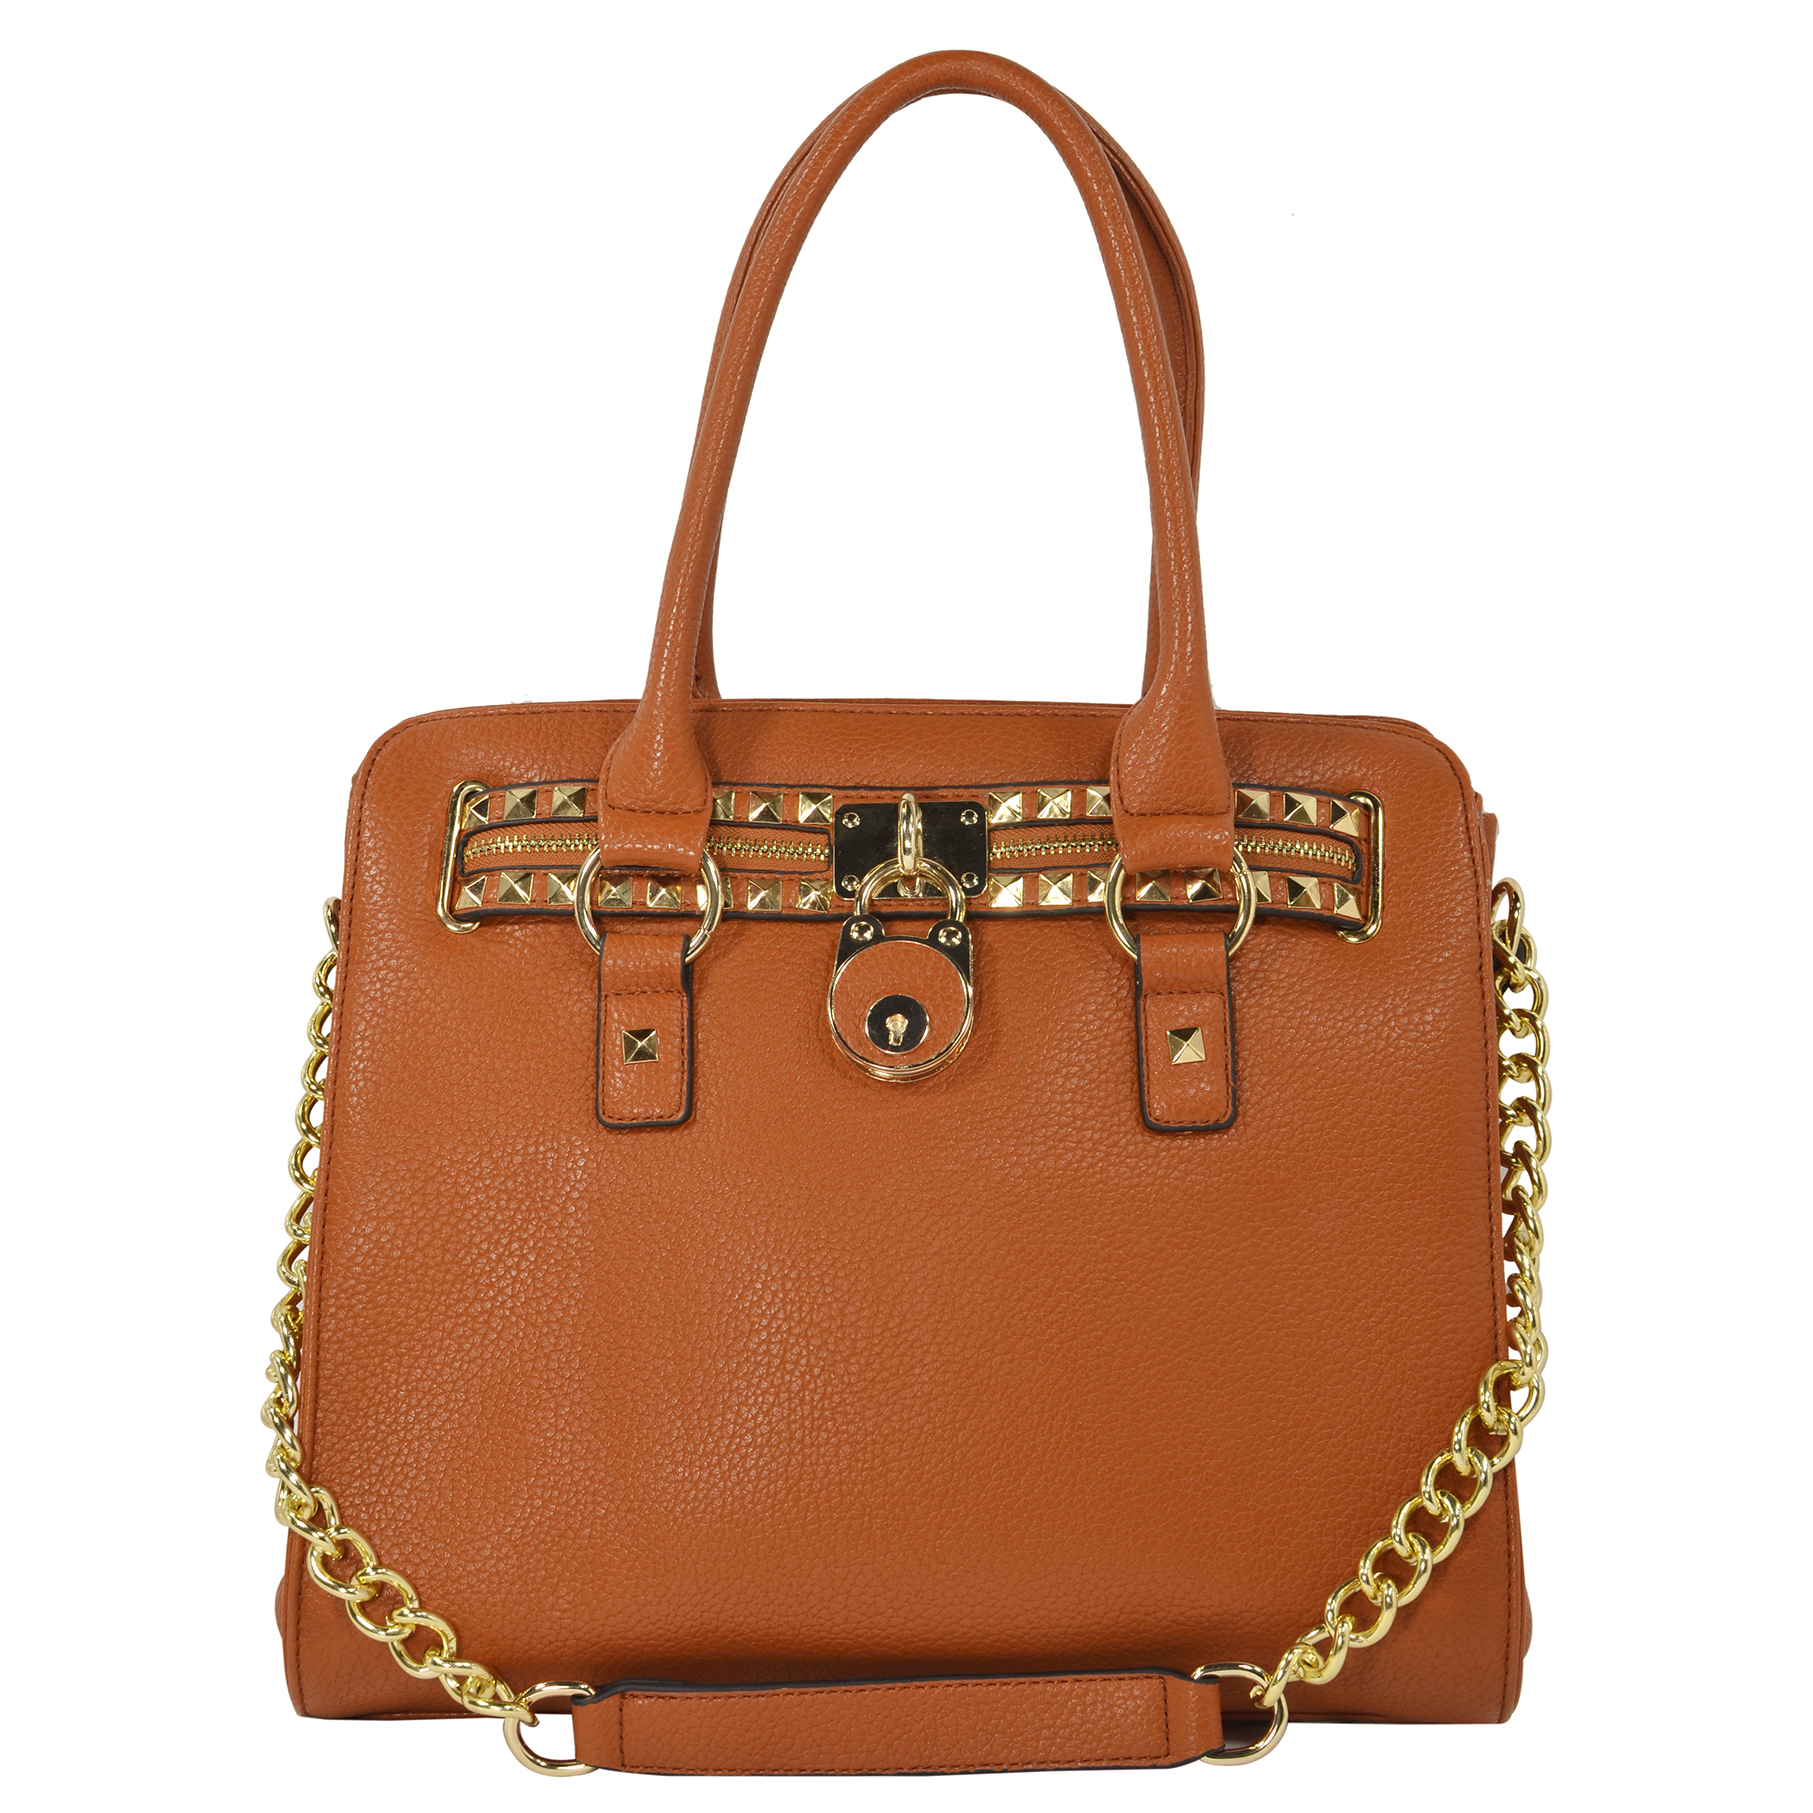 HALEY Brown Bowler Style Handbag Front